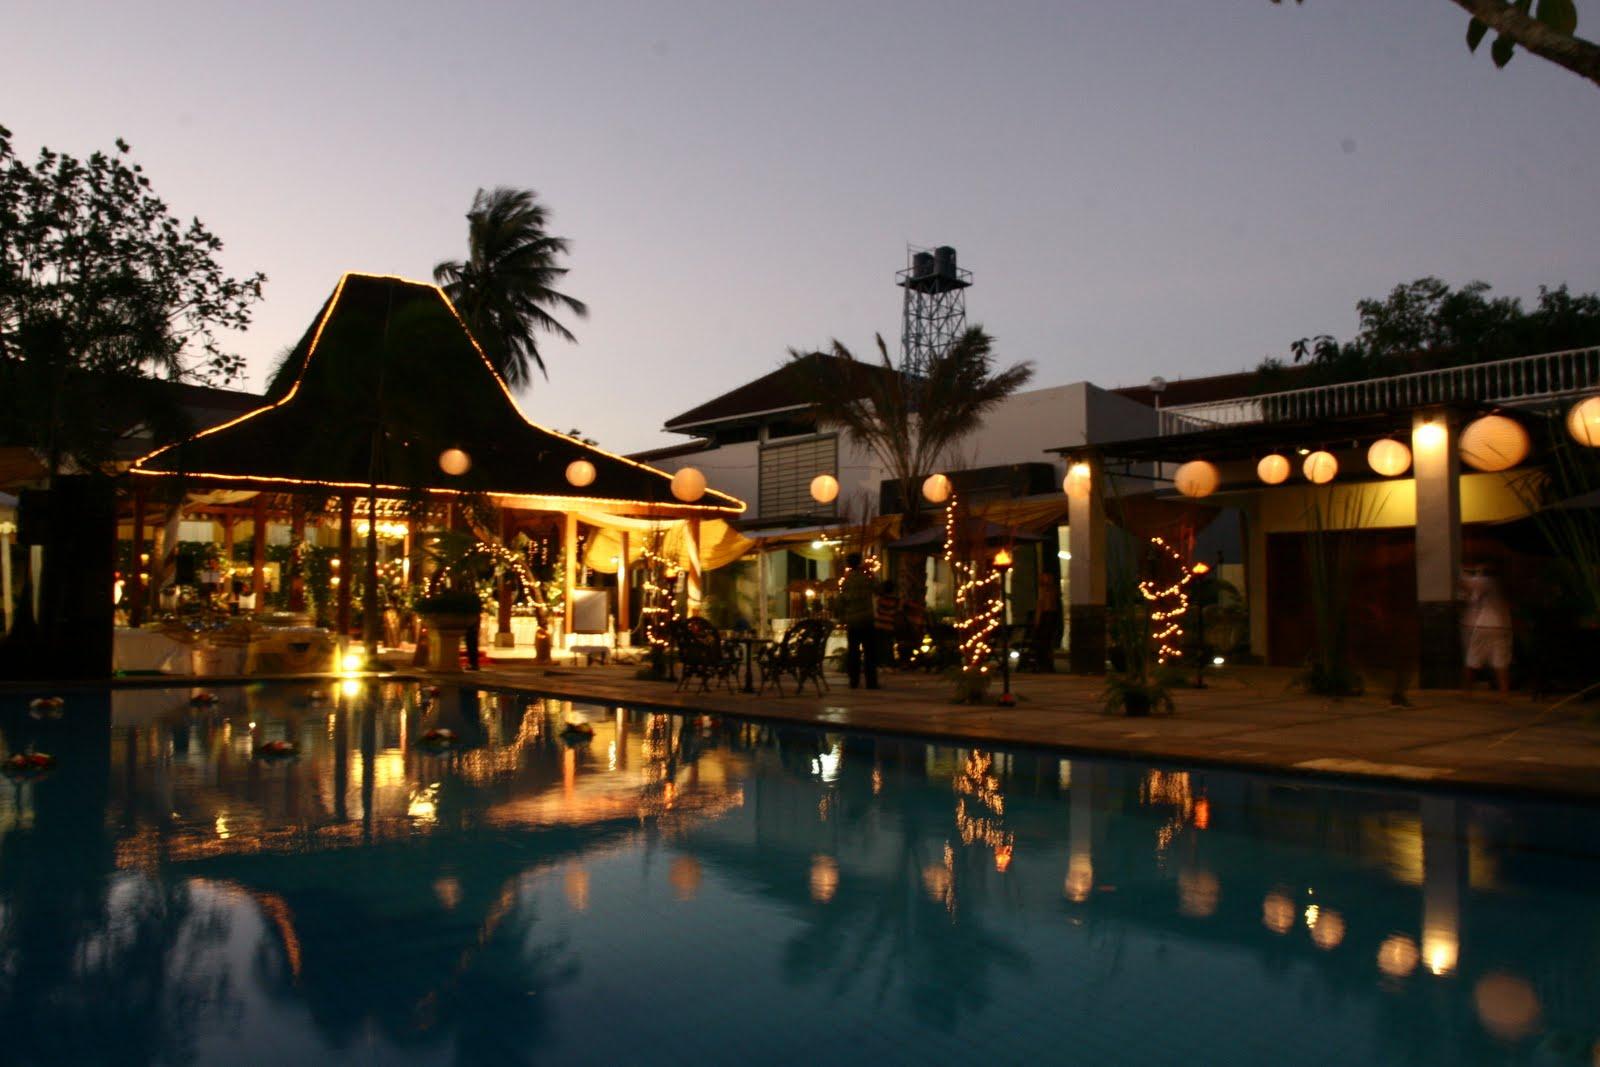 Chirp Tempat Resepsi Venue Outdoor Di Jakarta Part 3: OUTDOOR WEDDING VENUE 2016 (part 1): PENDOPO KEMANG Dan